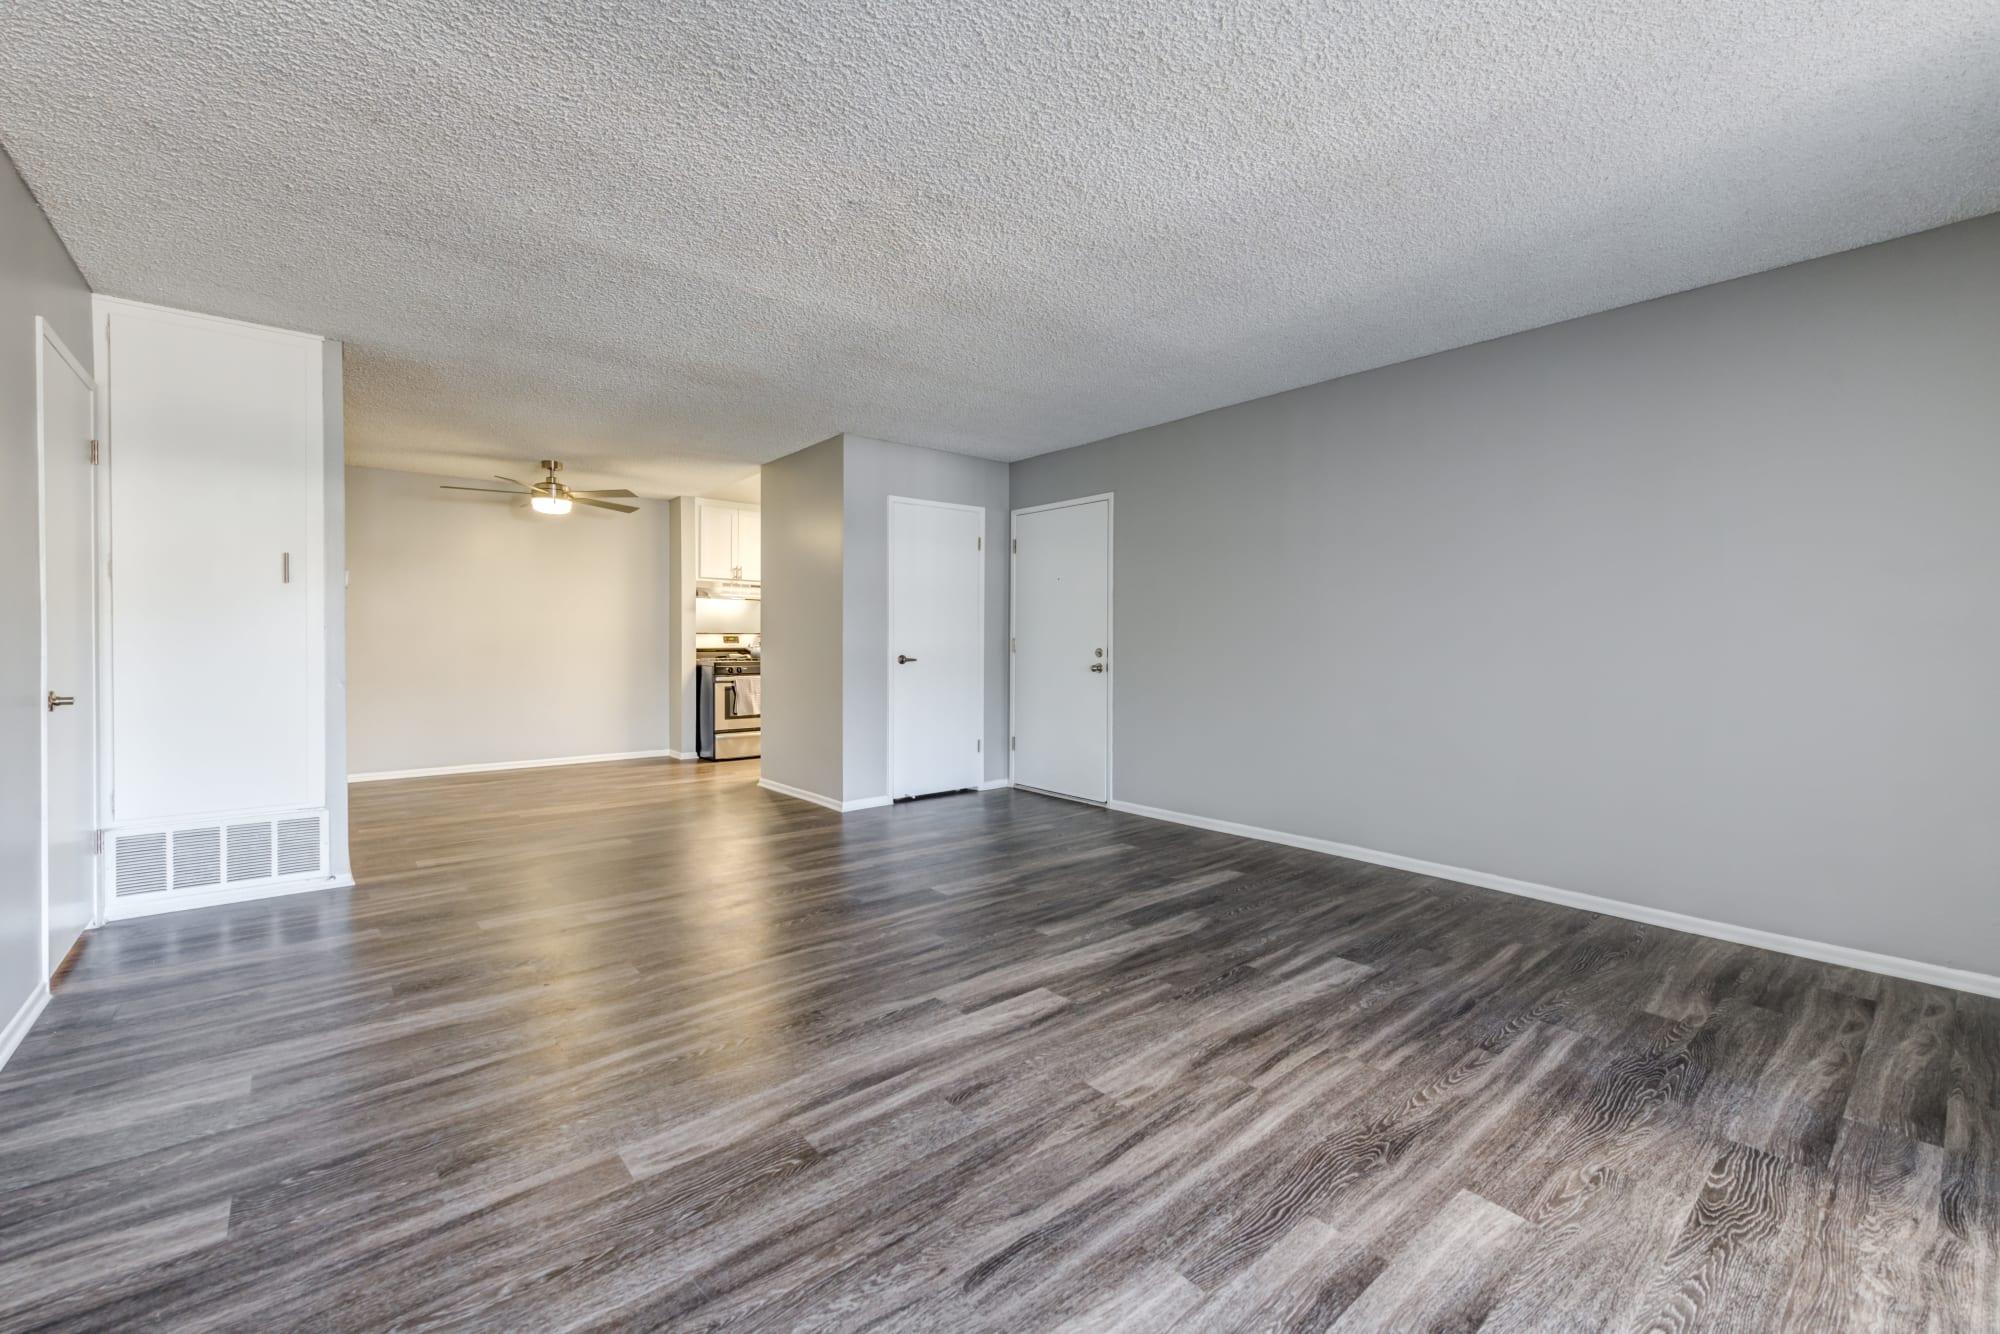 Hardwood Floors Available At Kendallwood Apartments